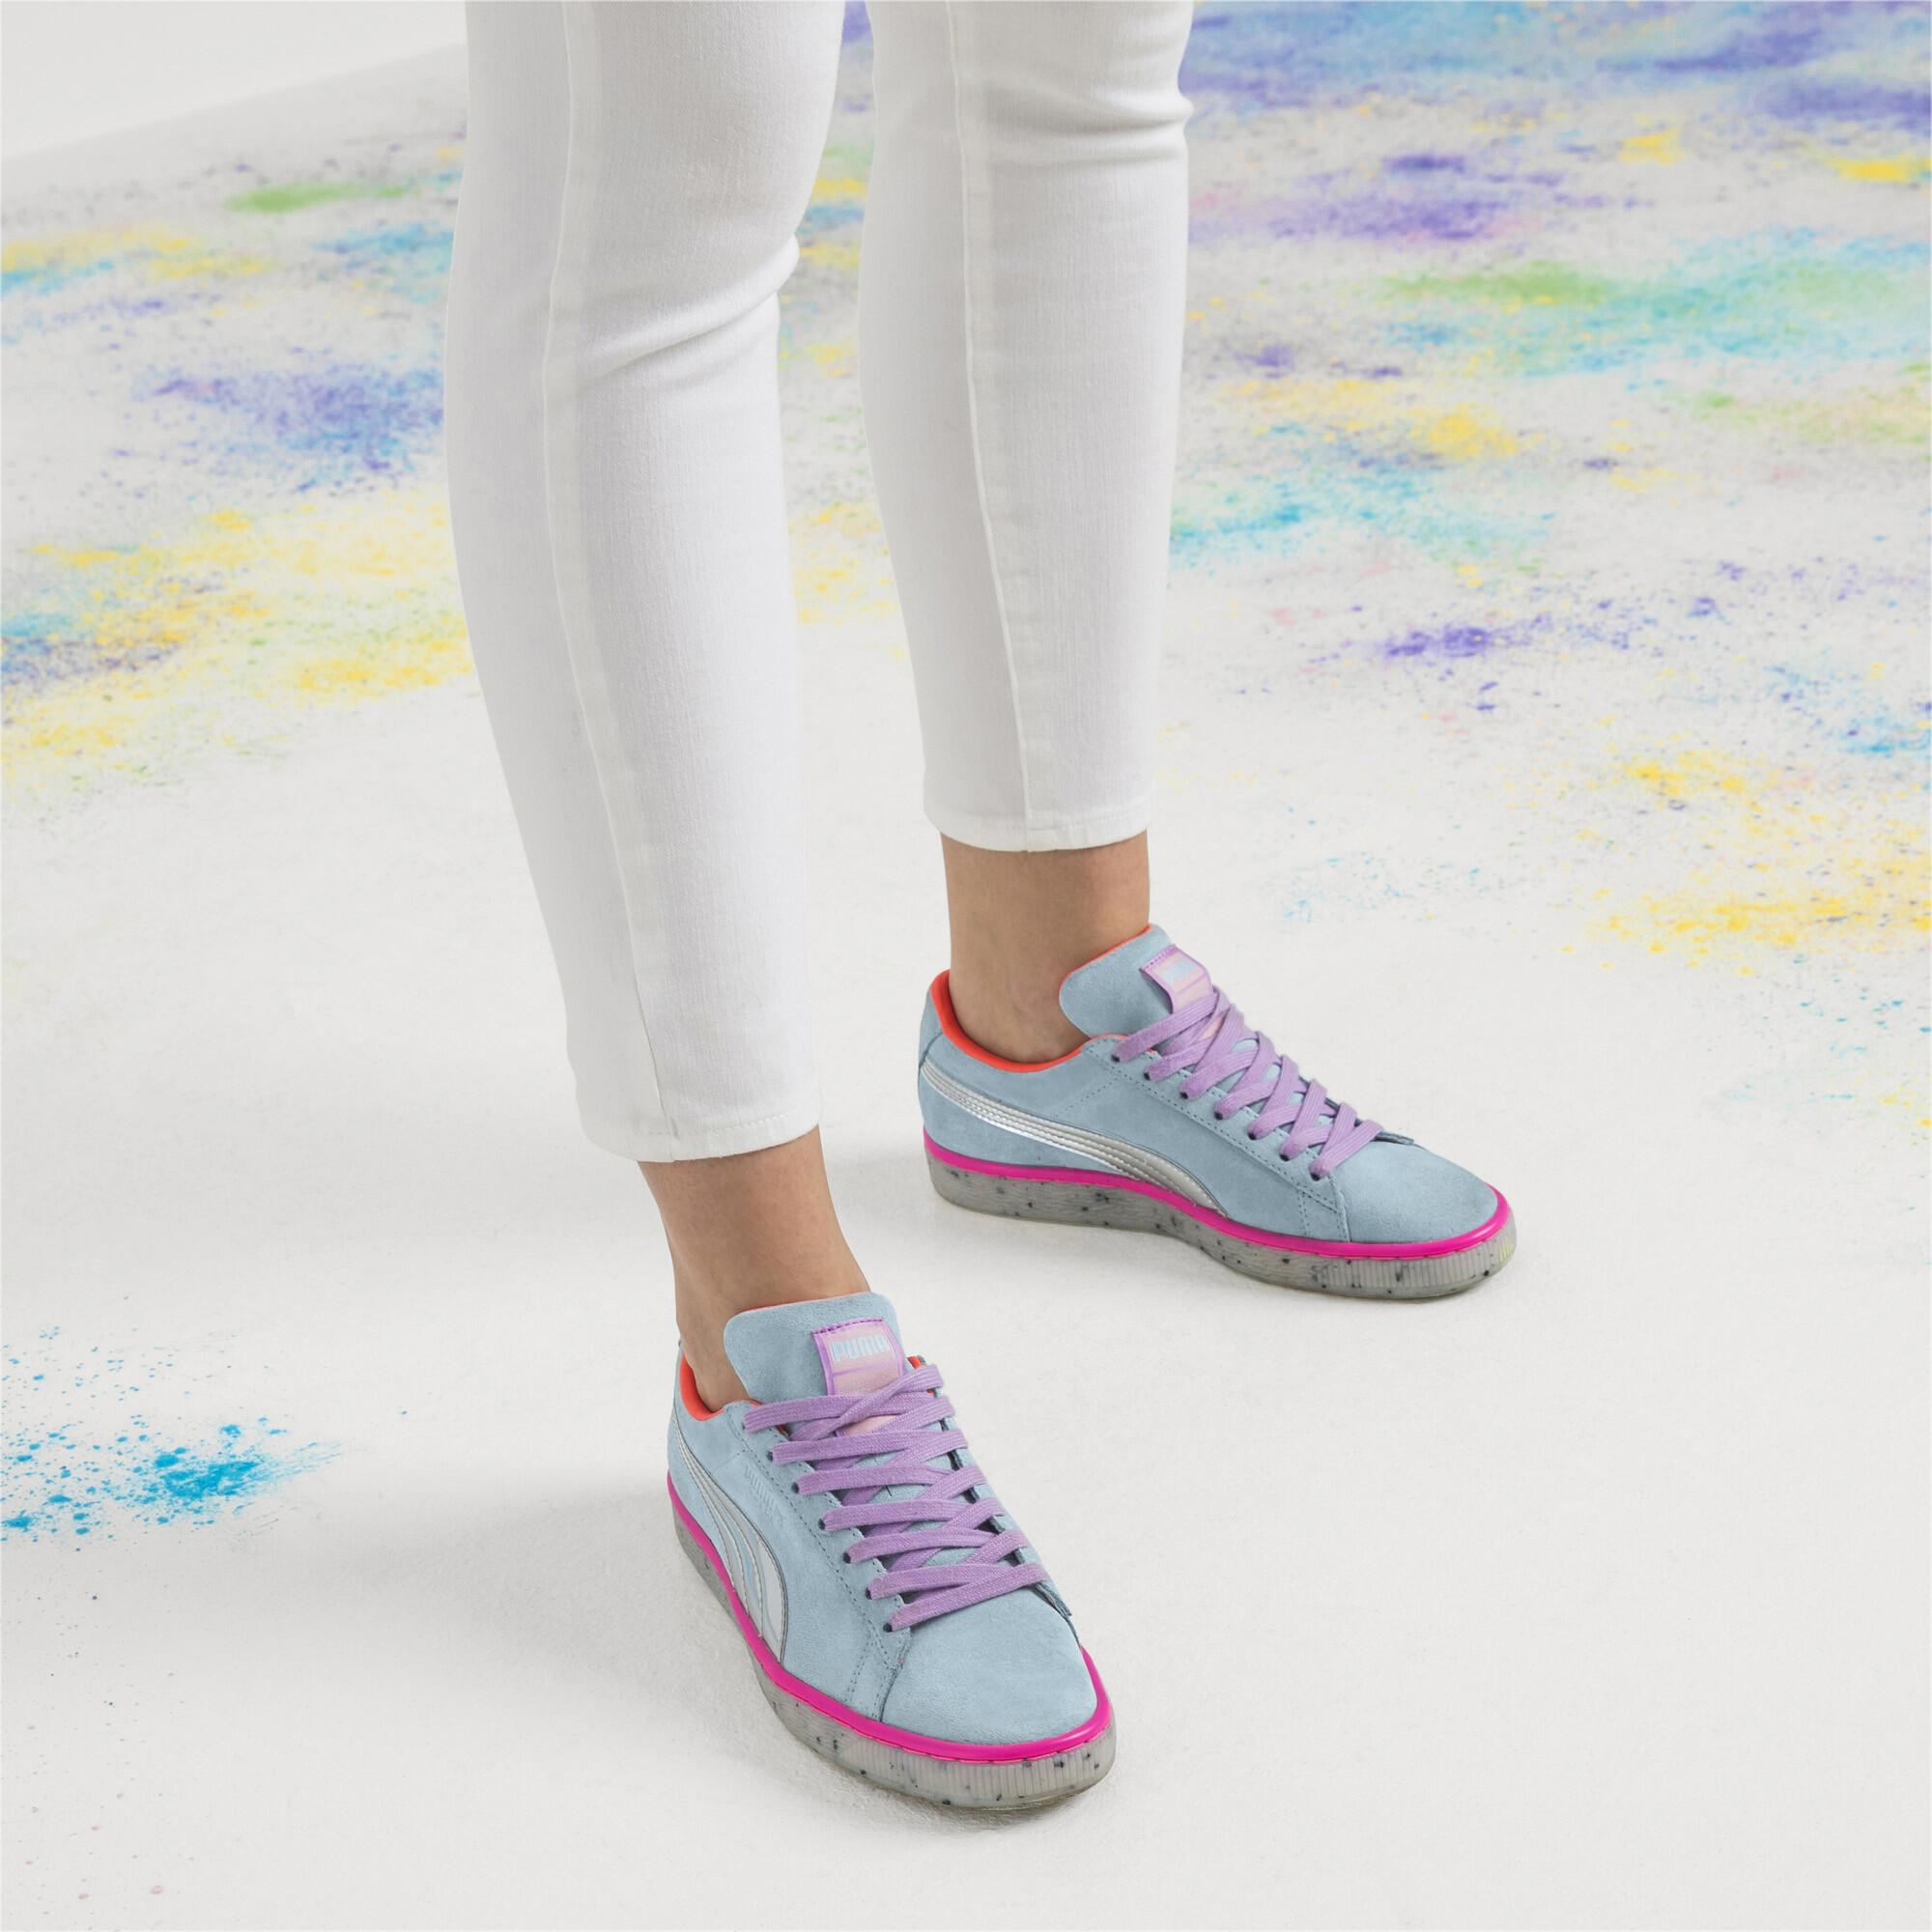 Image Puma PUMA x SOPHIA WEBSTER Women's Suede Candy Princess Sneakers #7